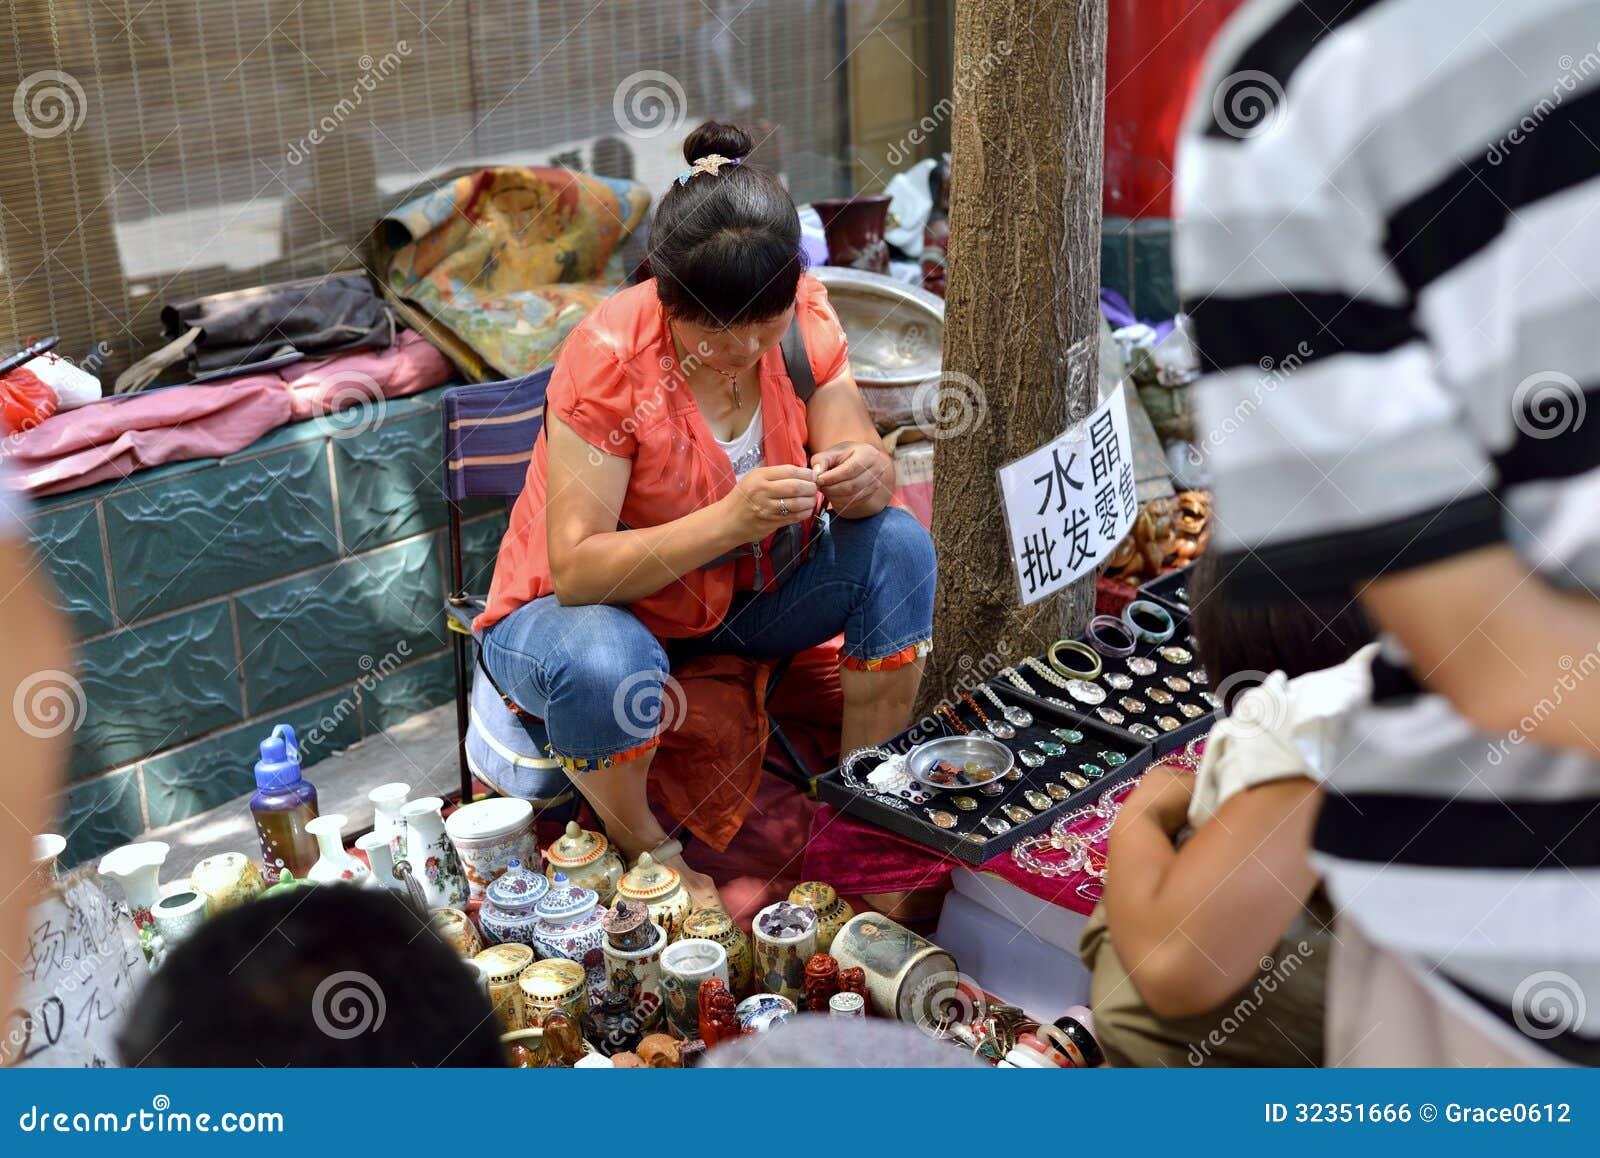 flea market vendor business plan